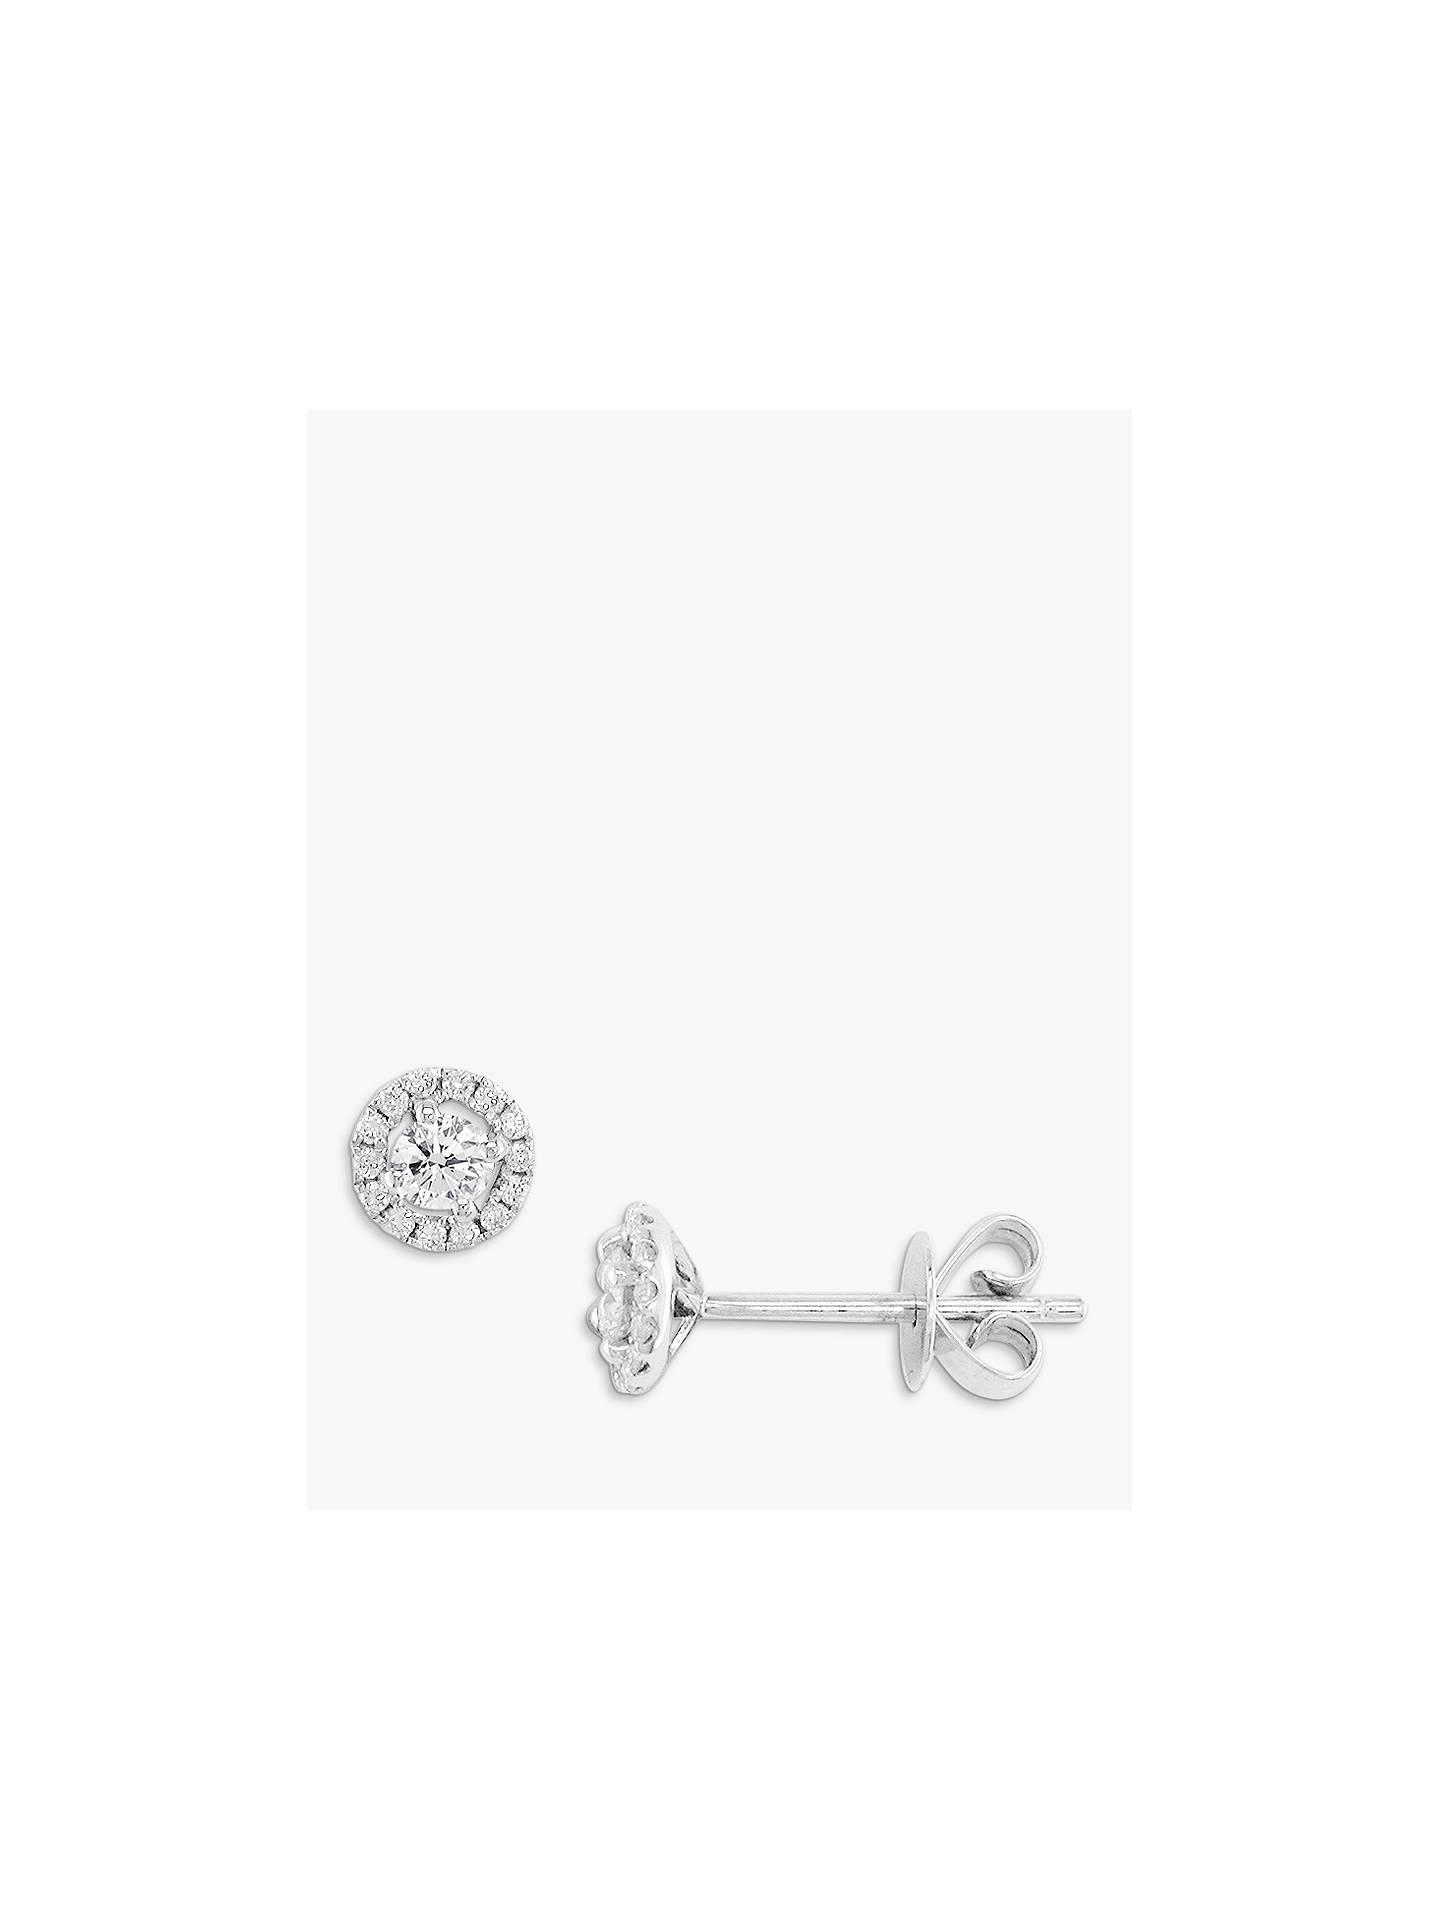 Ewa 18ct White Gold Diamond Cluster Stud Earrings White Gold At